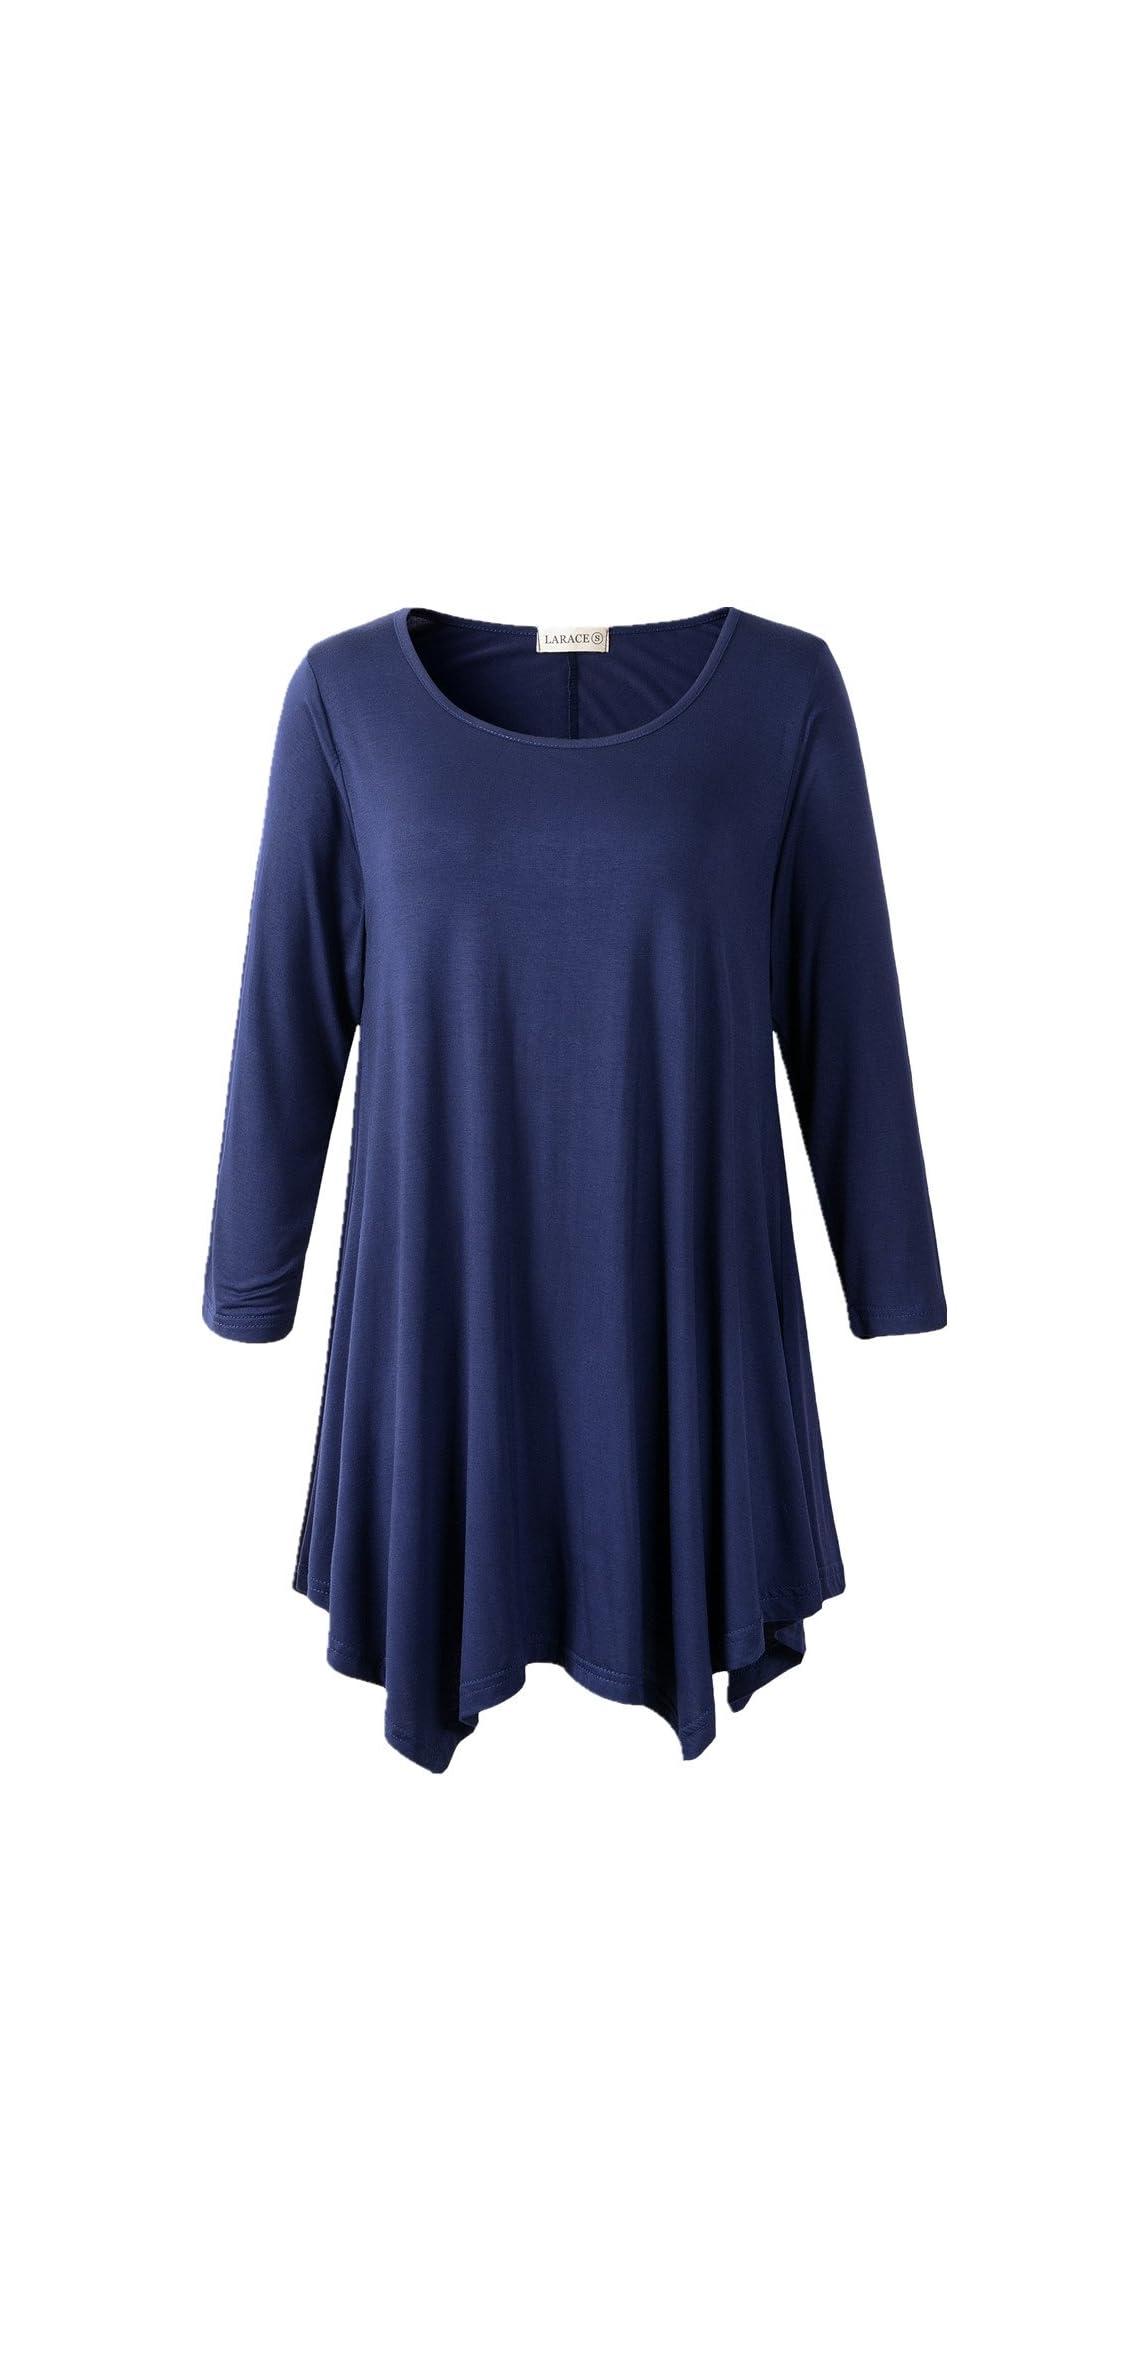 Women Plus Size / Sleeve Tunic Tops Loose Basic Shirt